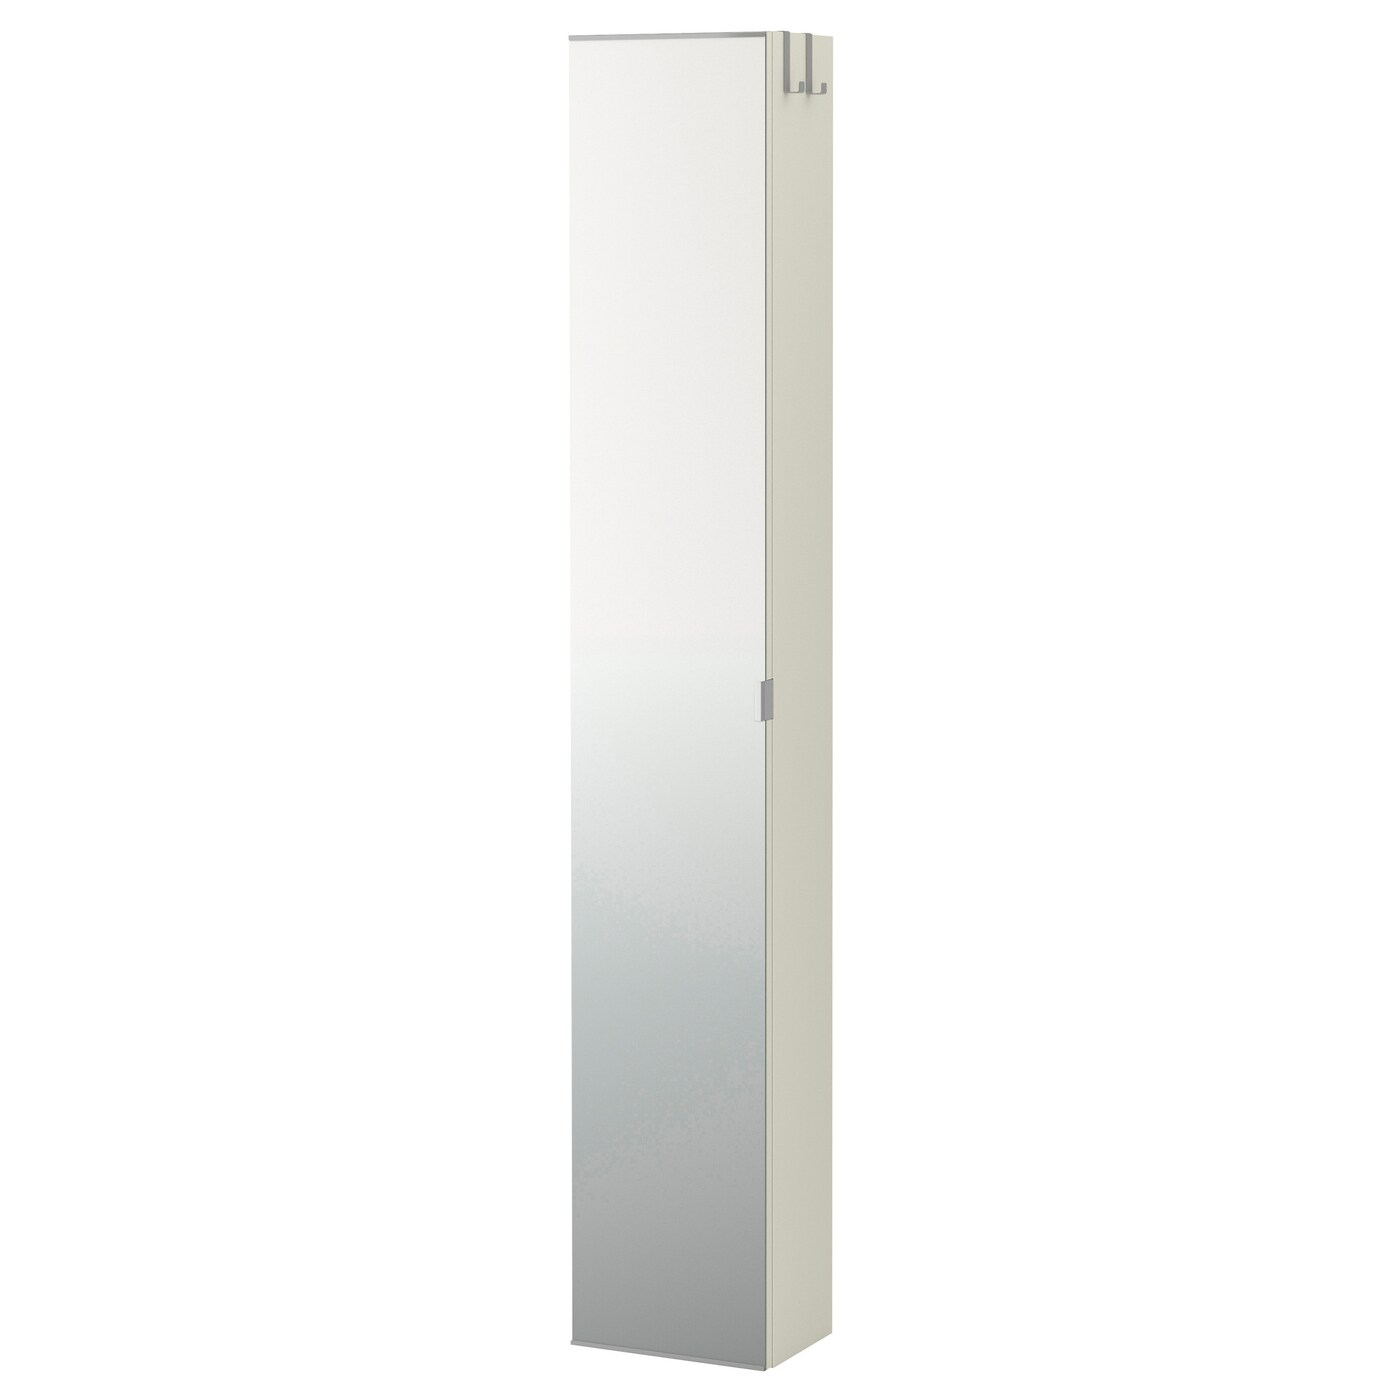 bathroom storage cabinets. IKEA LILLÅNGEN High Cabinet With Mirror Door Bathroom Storage Cabinets